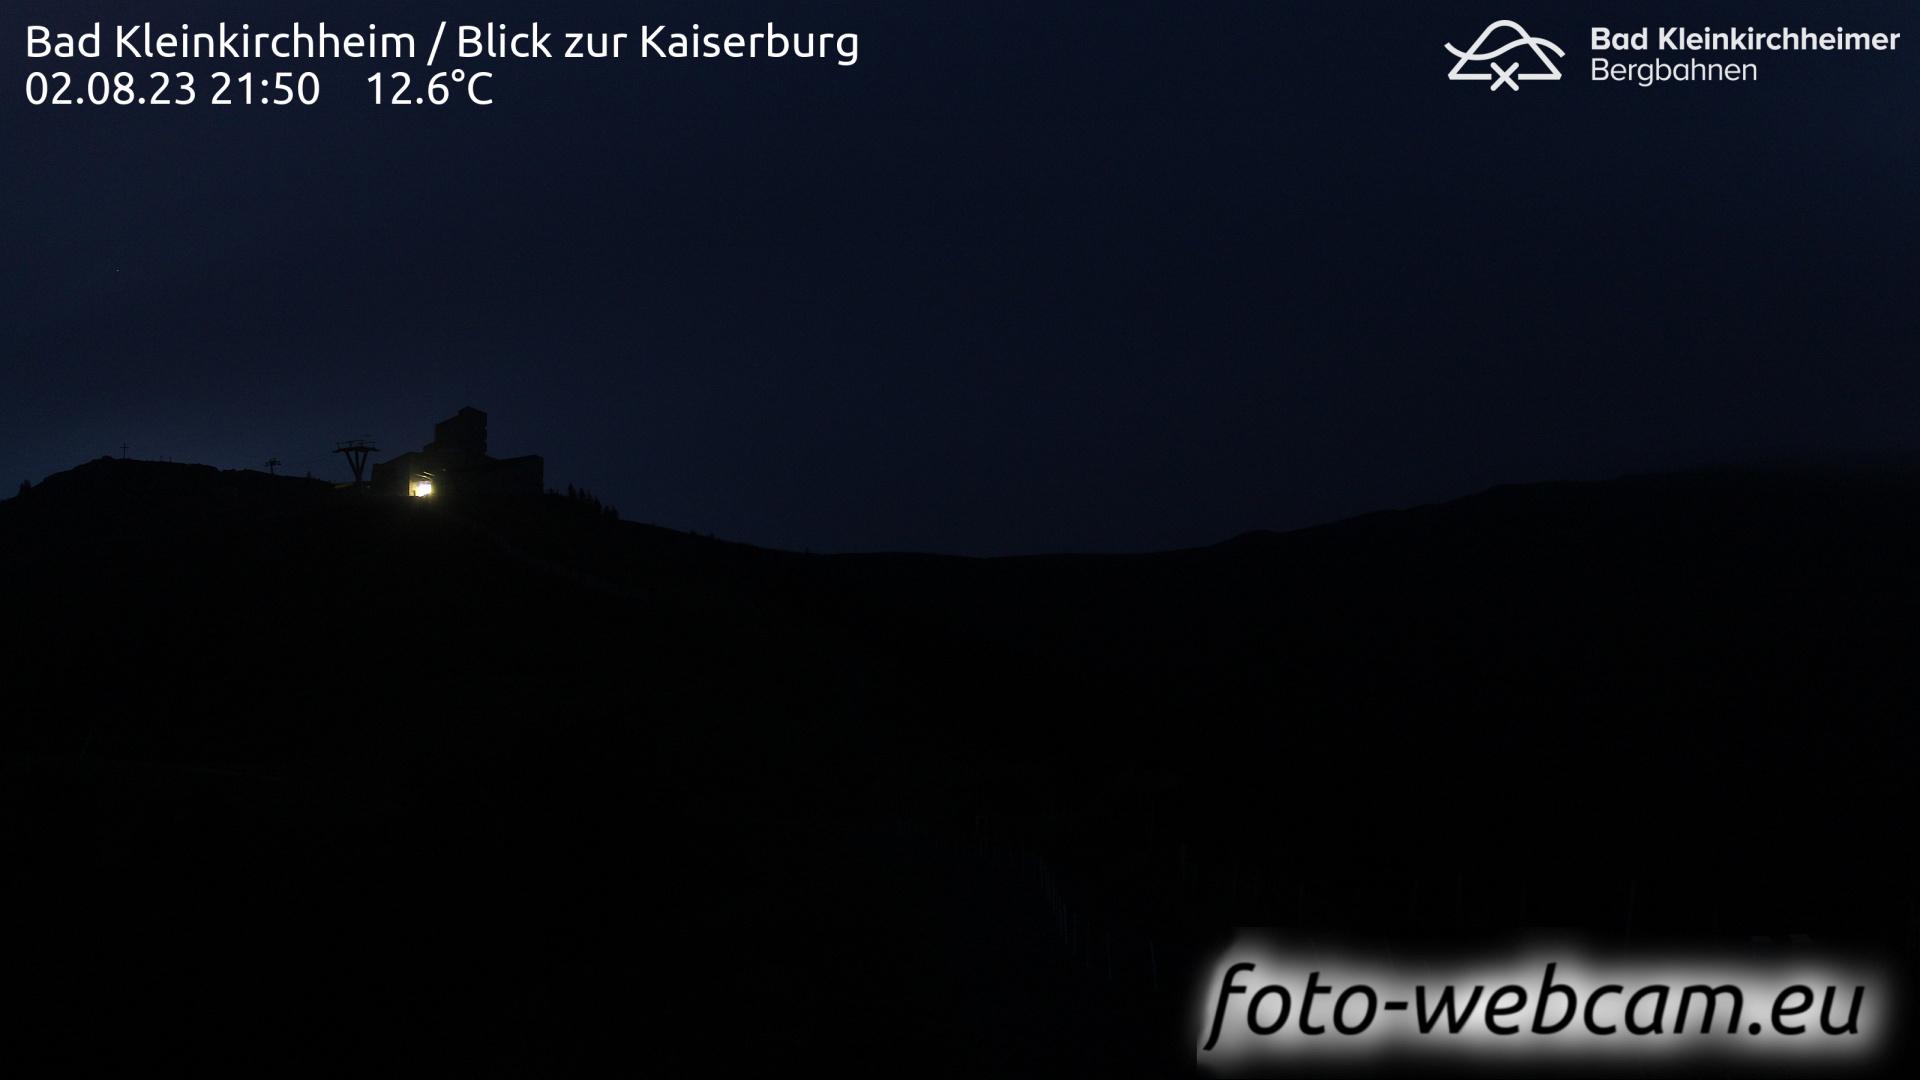 Bad Kleinkirchheim Thu. 21:23